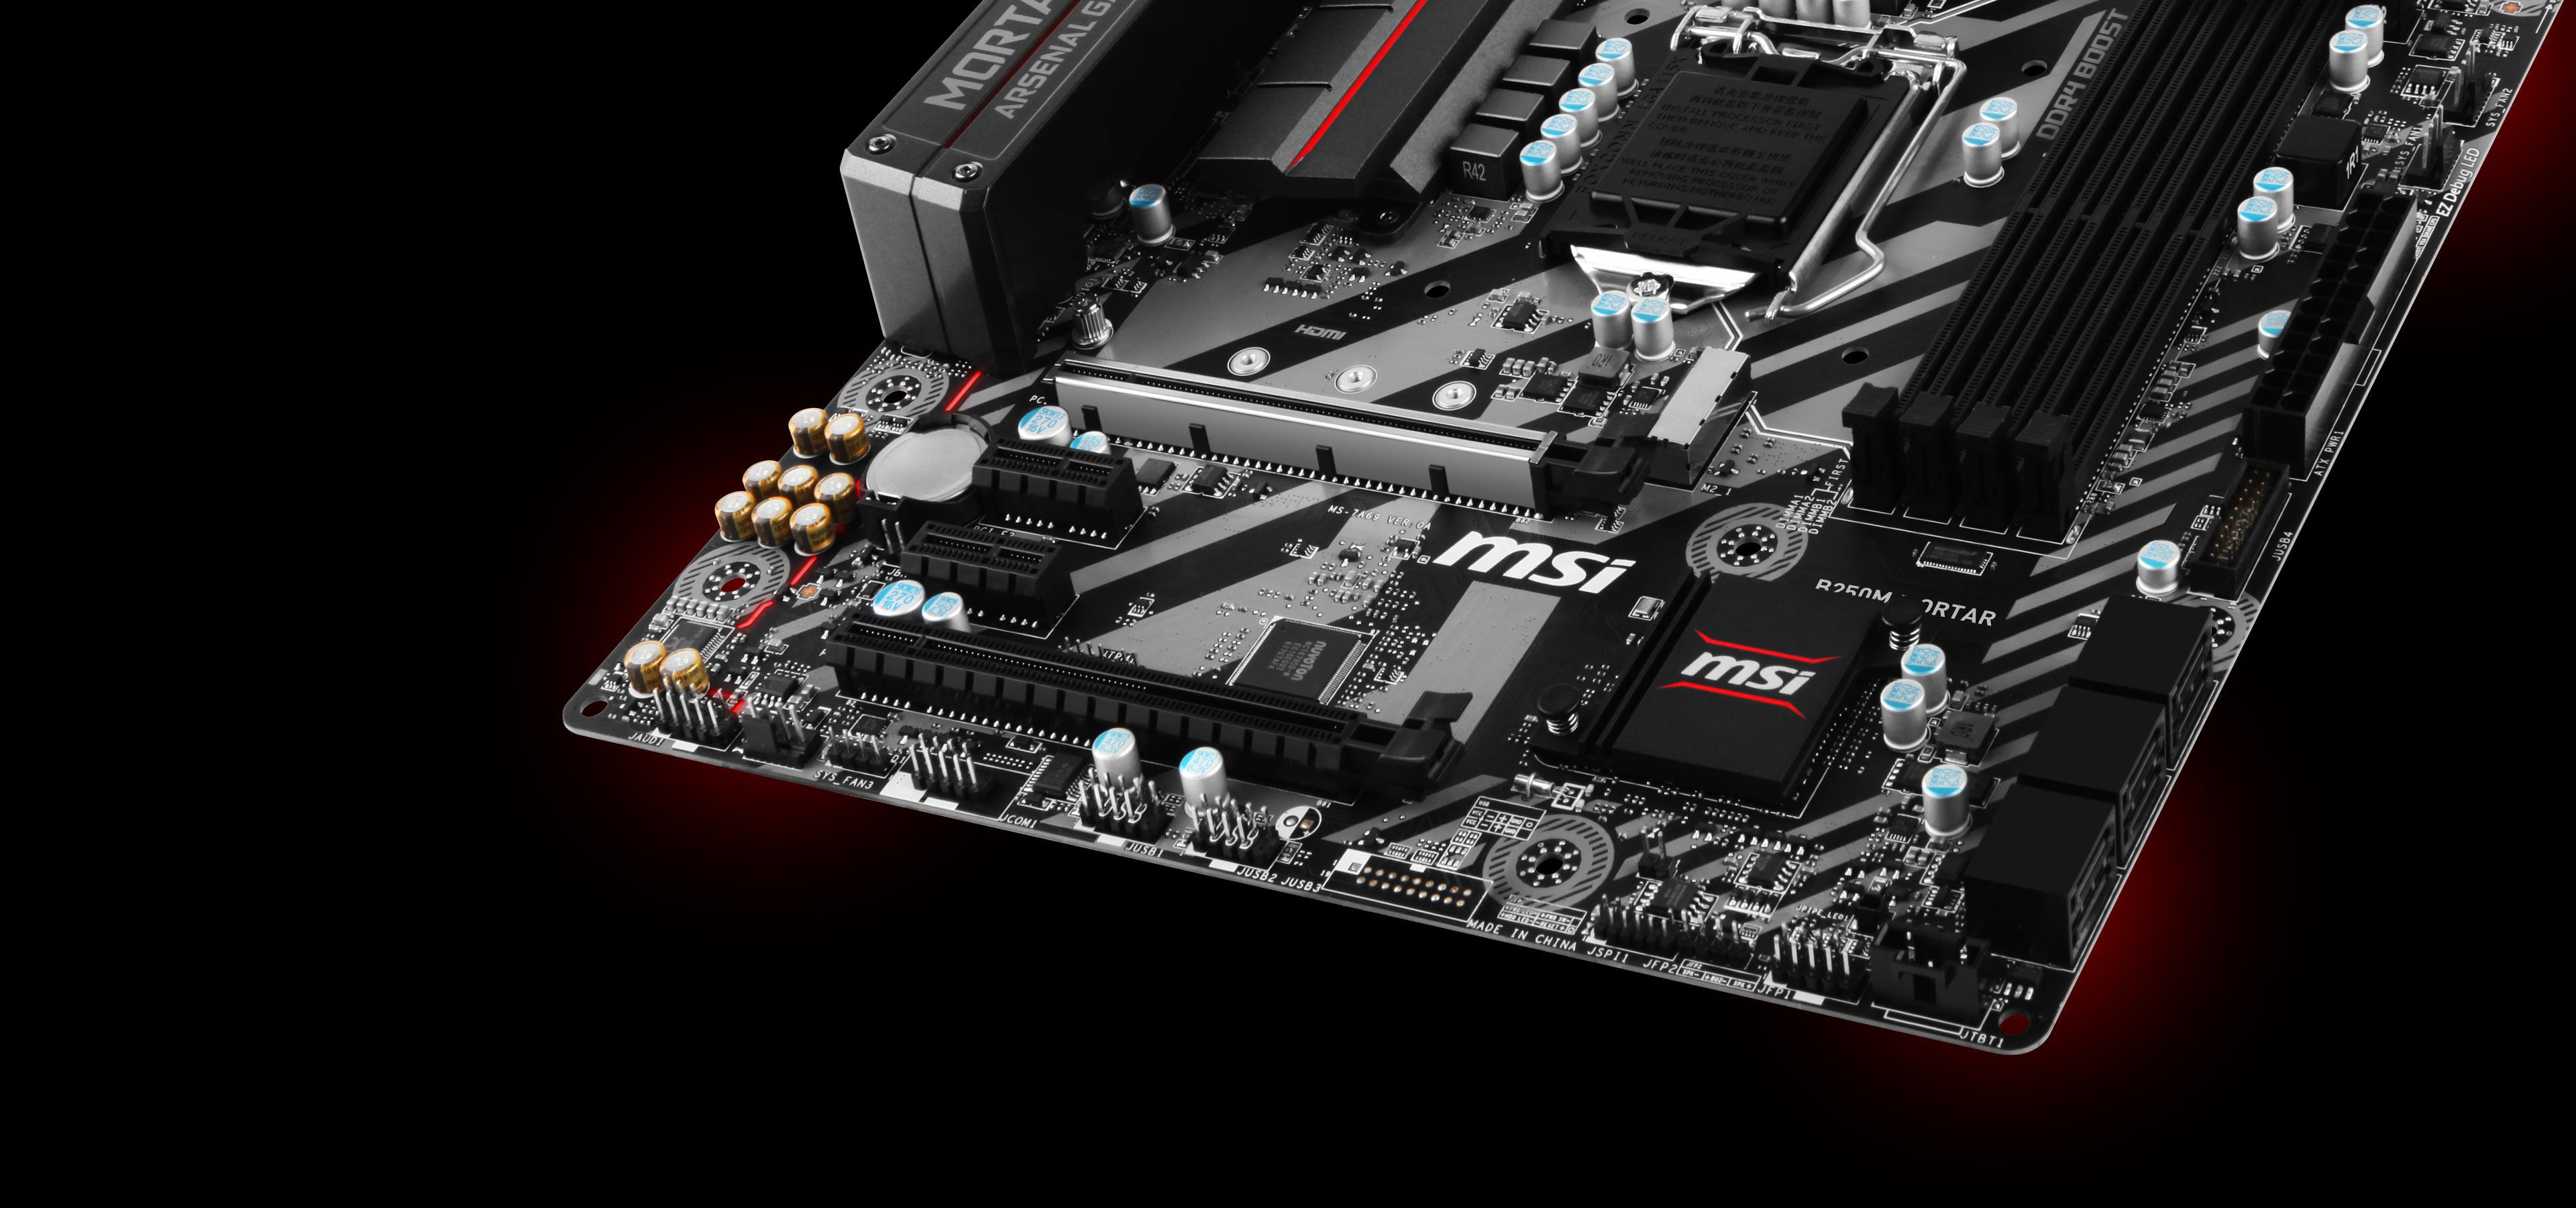 MSI B250M MORTAR VR Ready M-ATX Motherboard